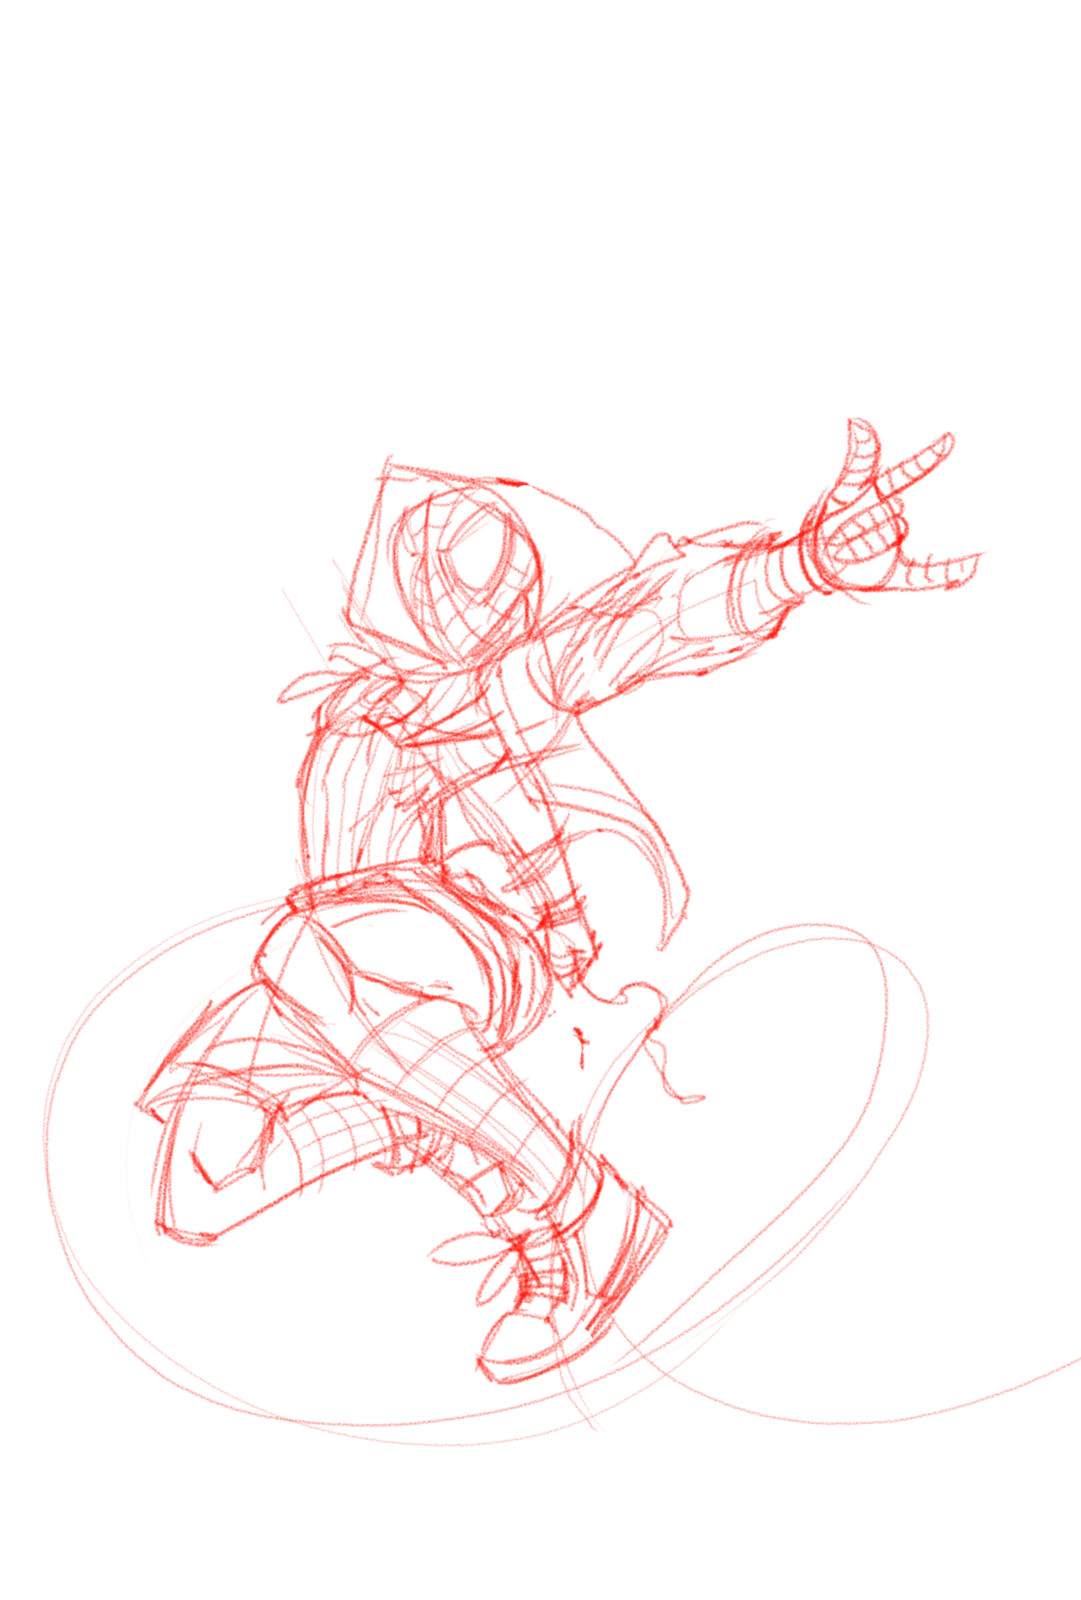 01-Initial rough sketch